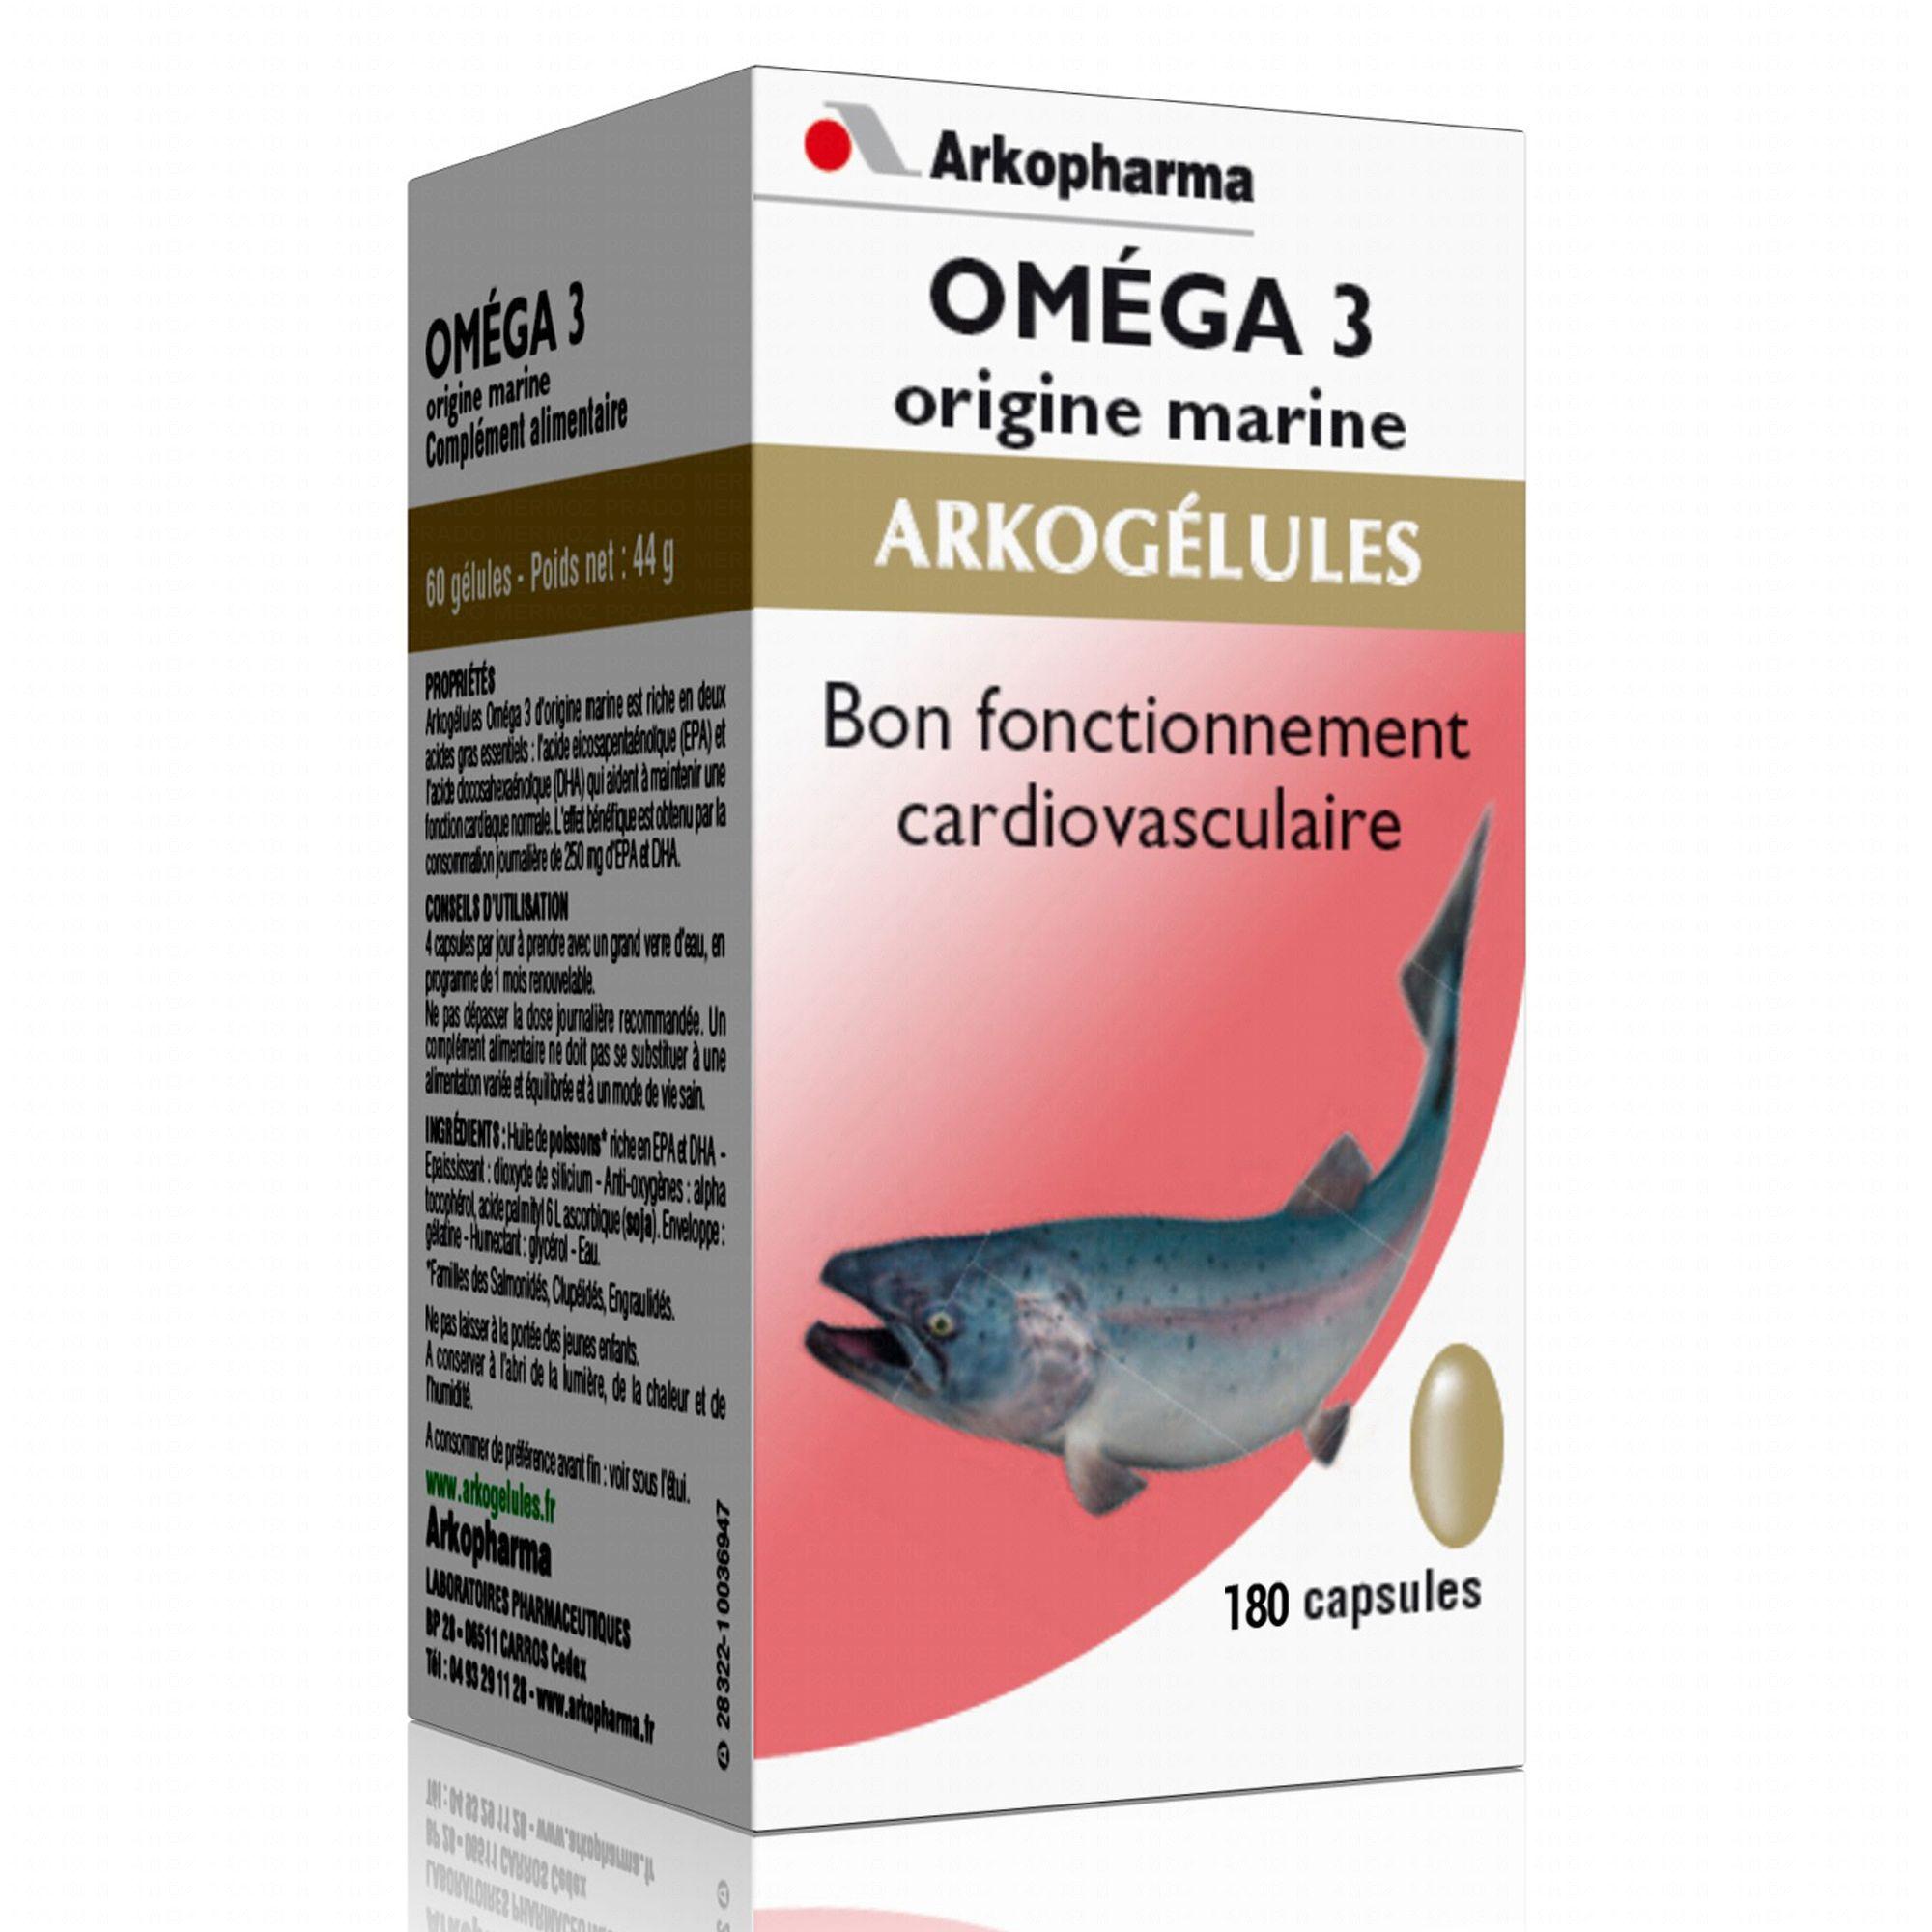 omega 3 arkopharma